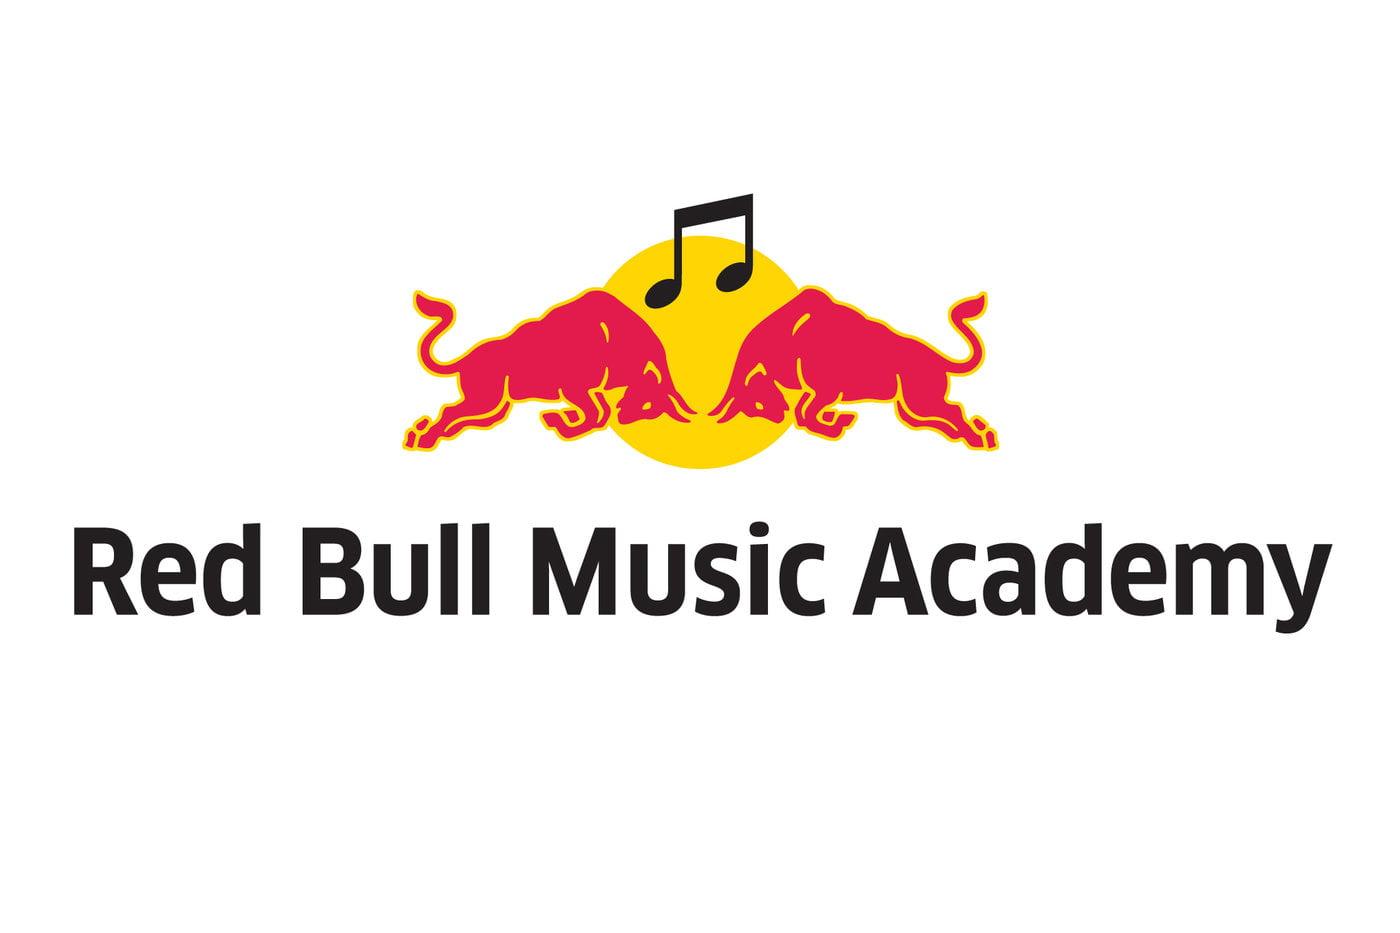 Red bull music academy – לונדון 2010